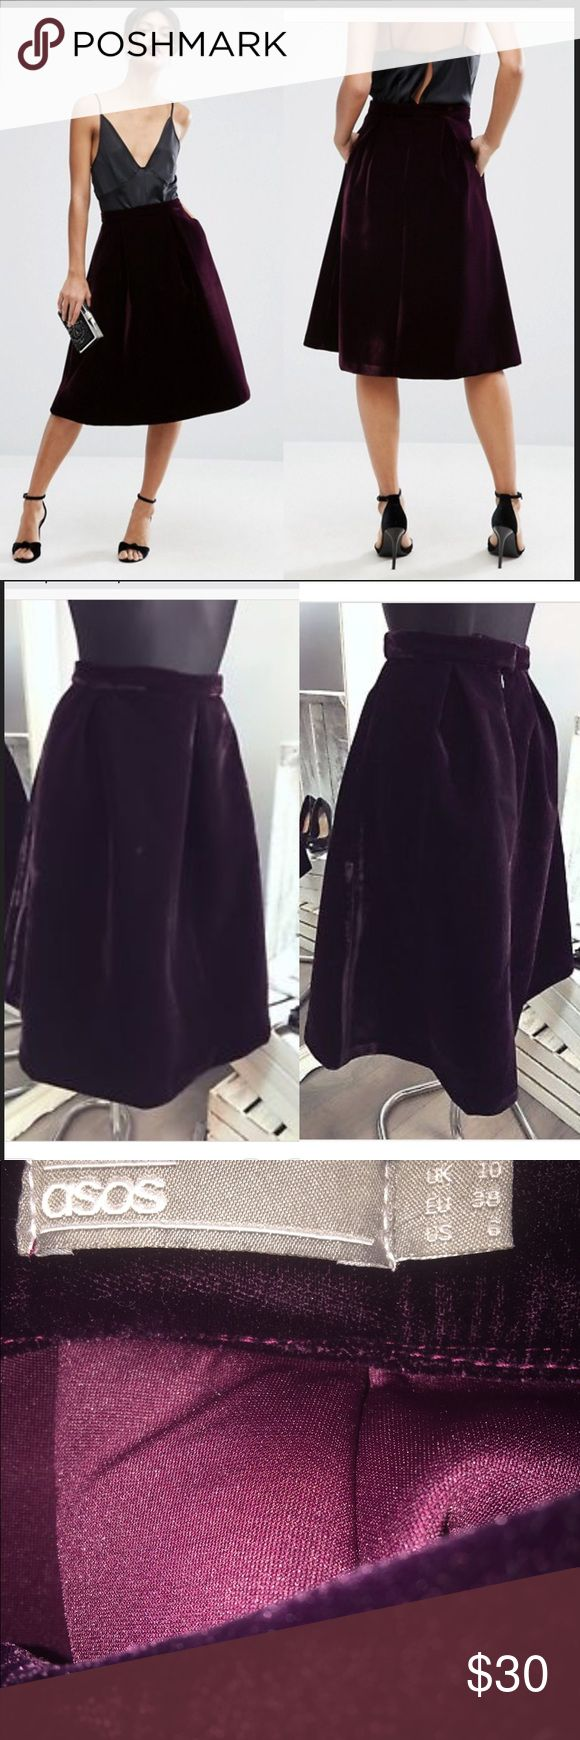 "ASOS Premium Prom Skirt in Bonded Velvet purple ASOS Premium Prom Skirt in Bonded Velvet color is dark berry very very dark maroon purple 14"" waist flat. 27"" length. Measurements from asos site. Worn once ASOS Skirts"